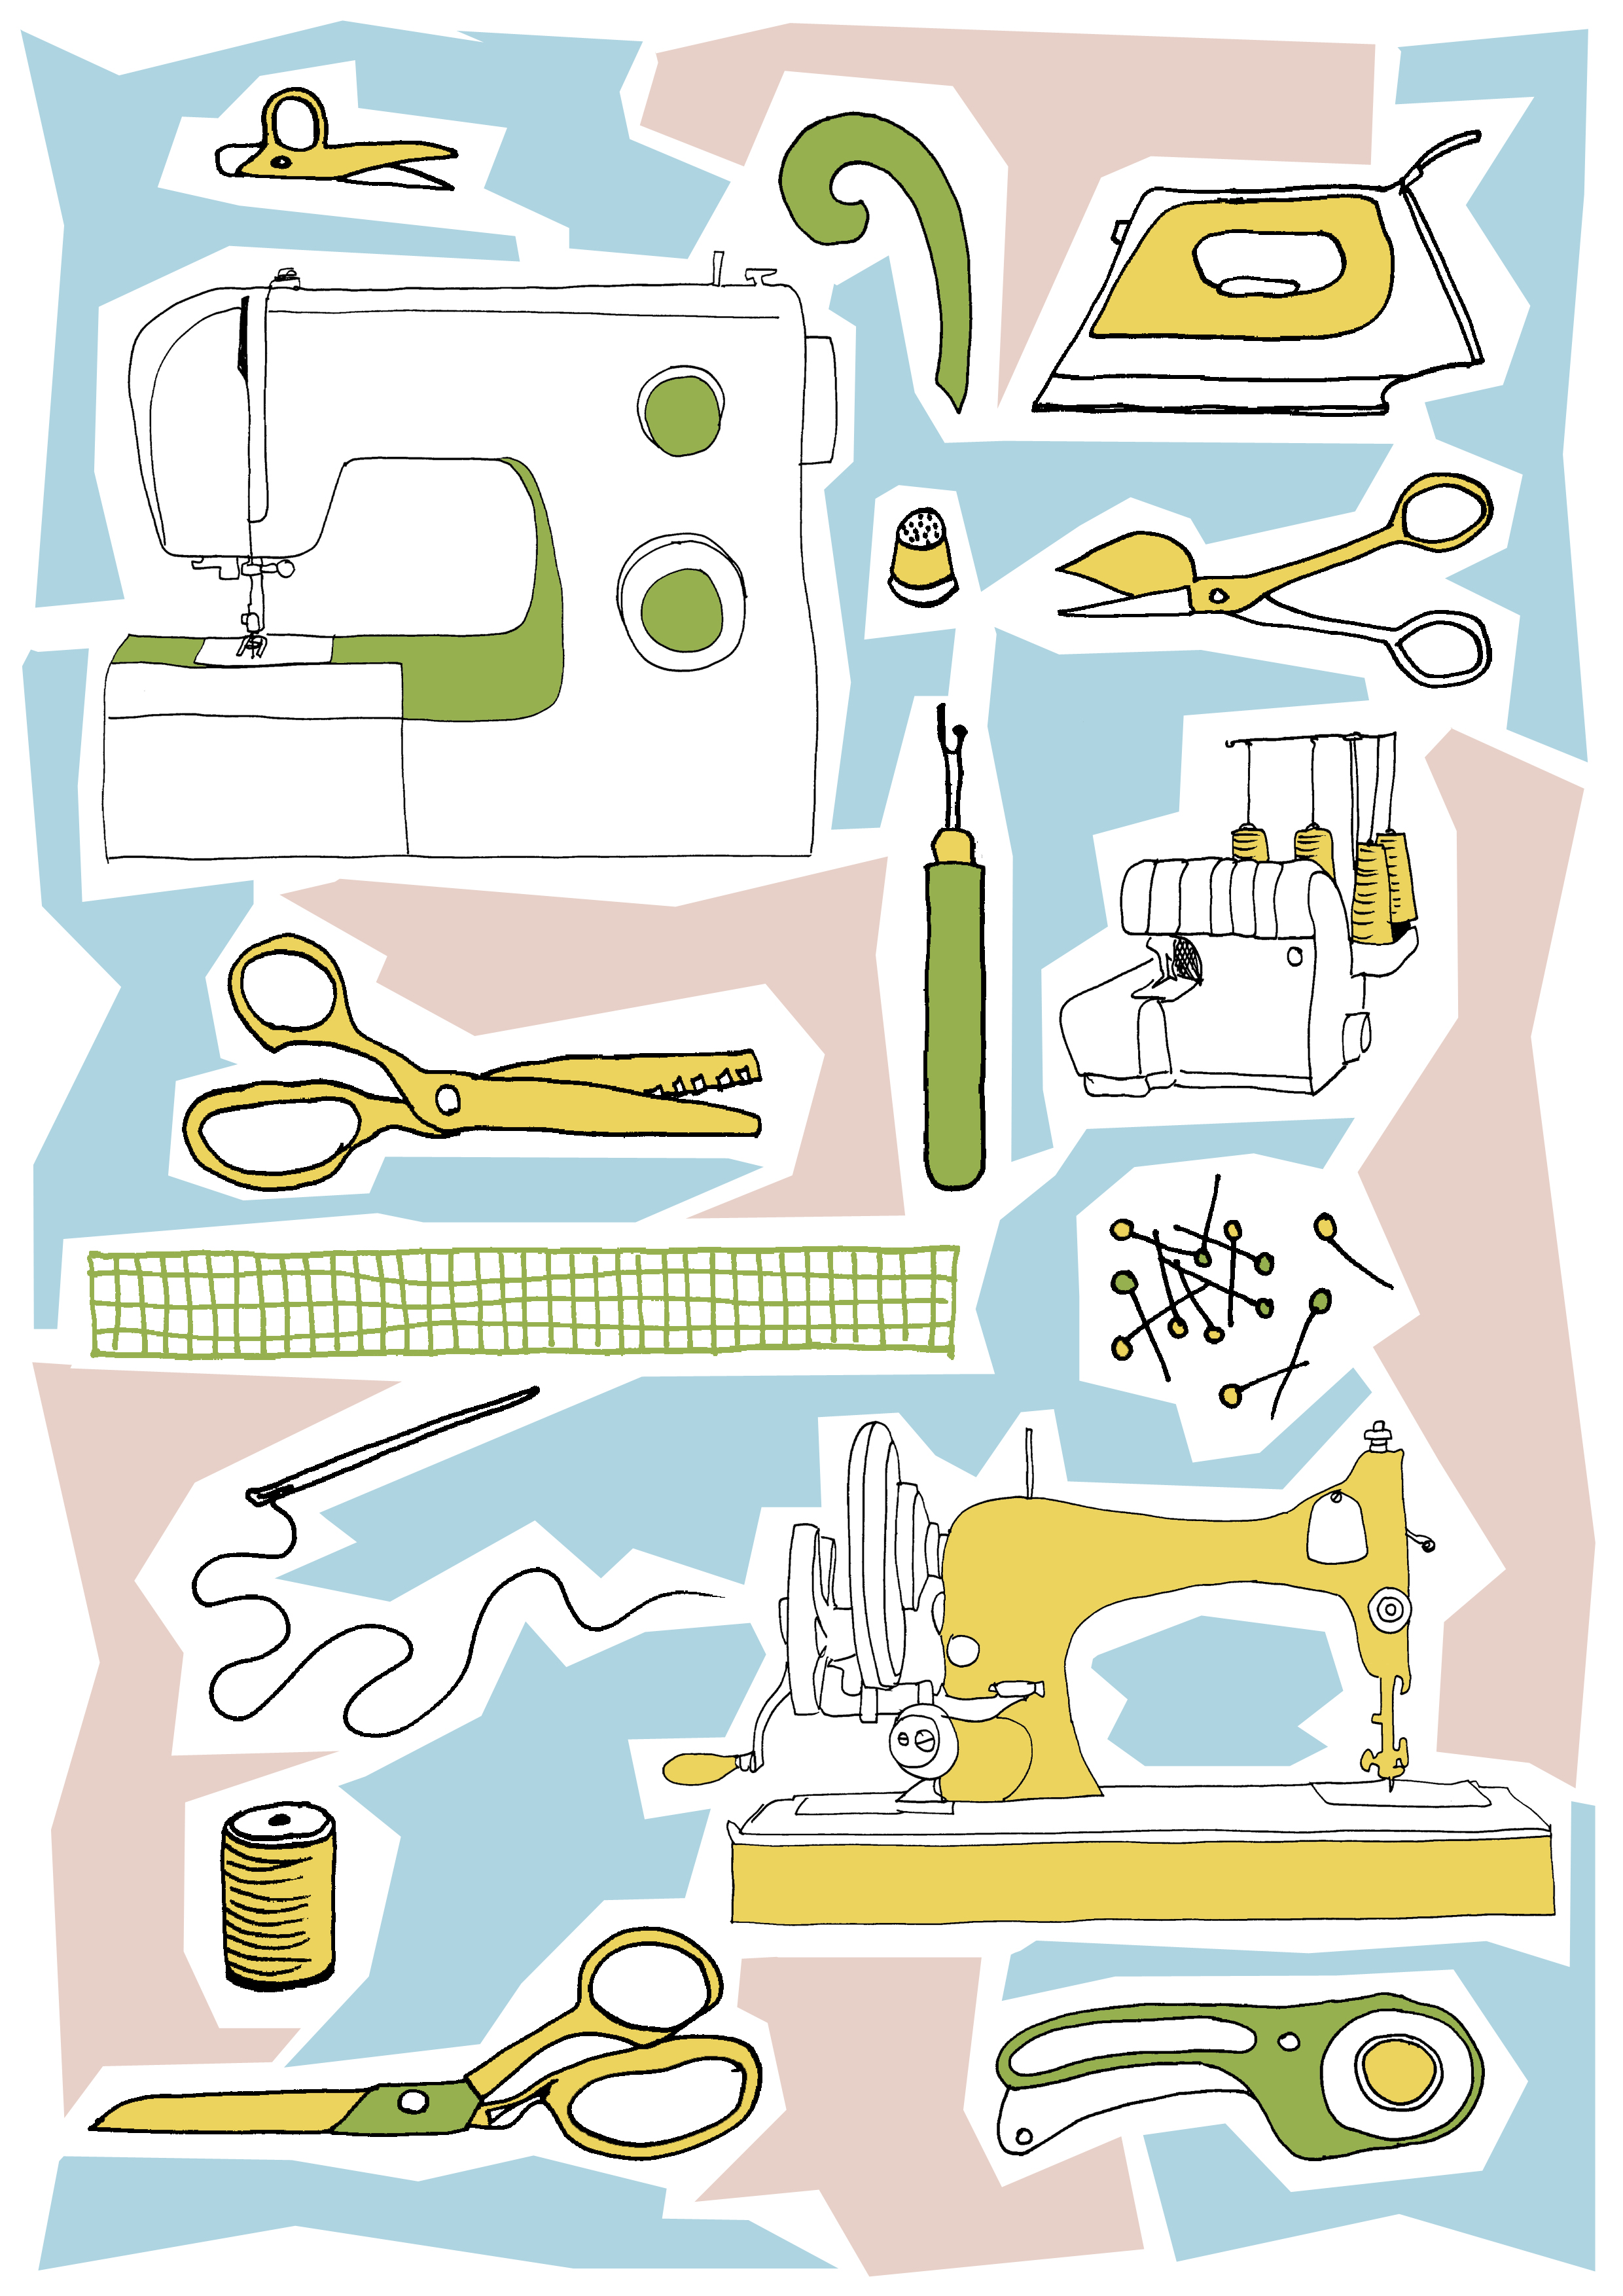 Sewing Illustration Coloured.jpg